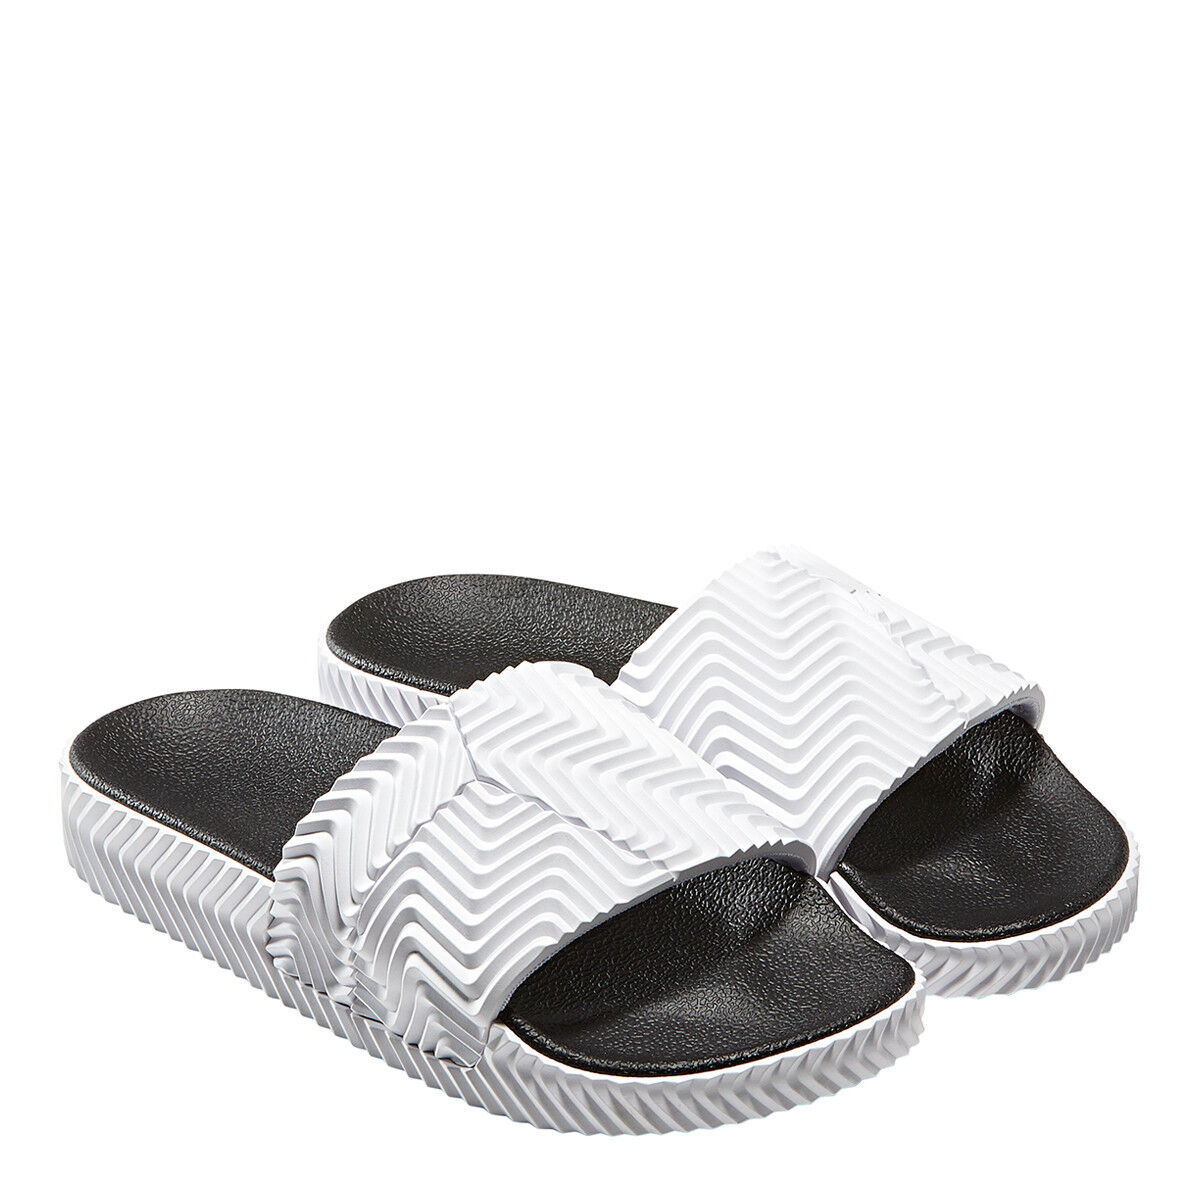 Adidas Originals By Alexander Wang Drop 3 blanc Sandals